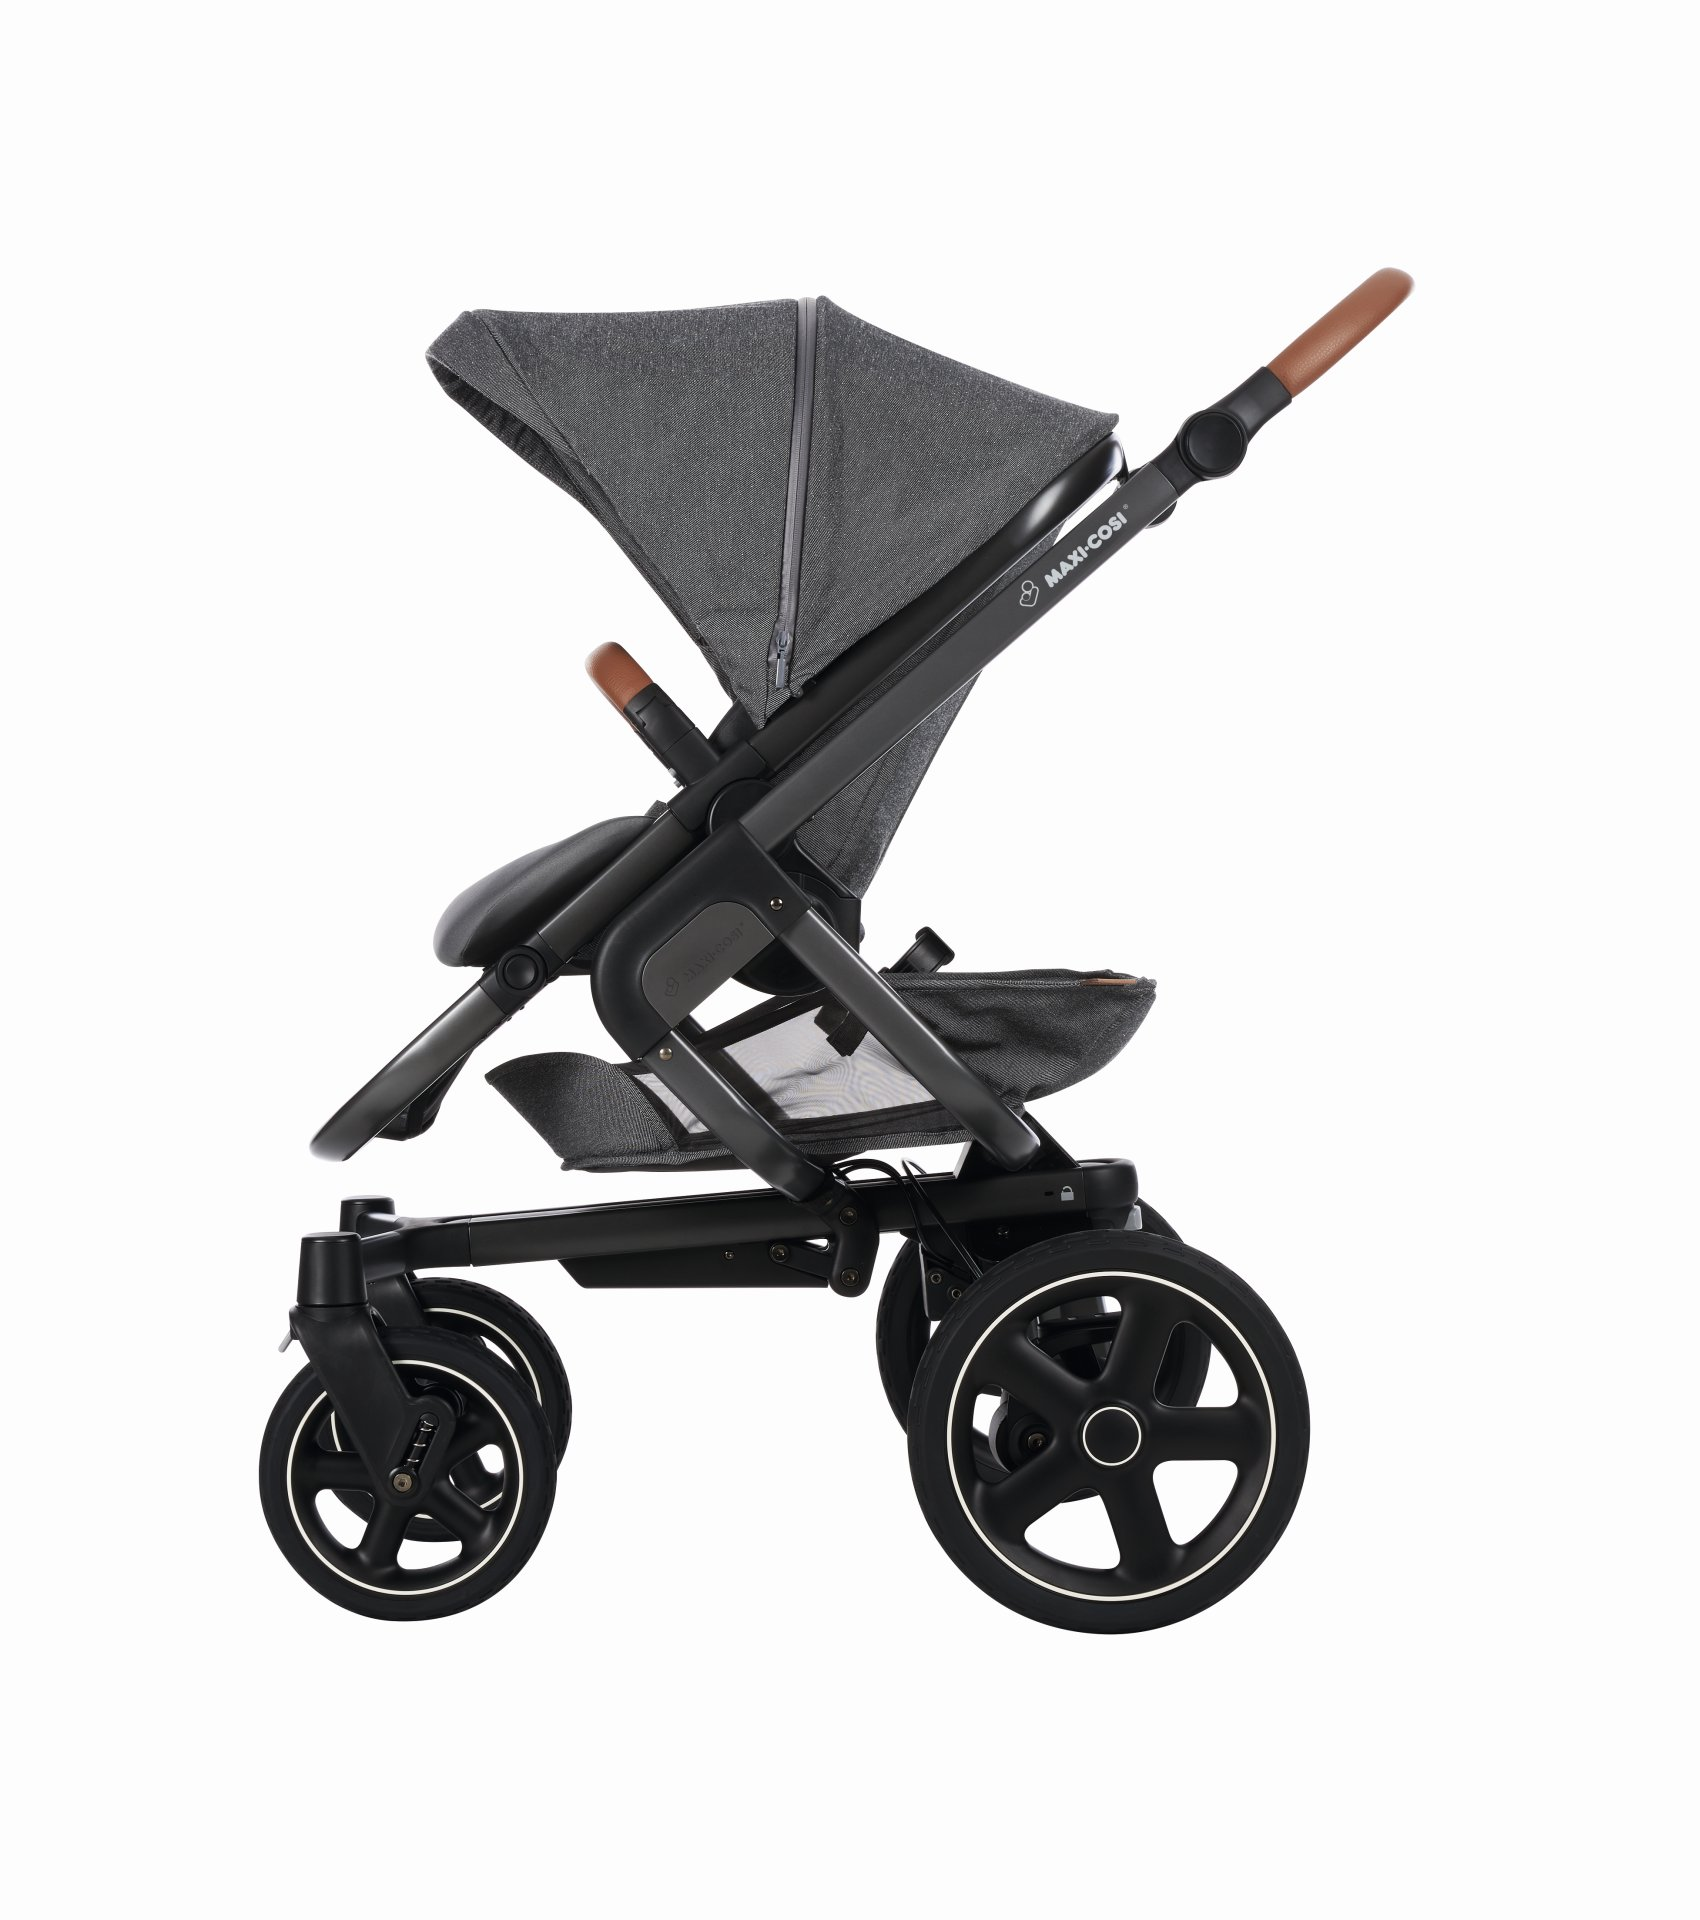 poussette maxi cosi nova 4 roues 2018 sparkling grey. Black Bedroom Furniture Sets. Home Design Ideas